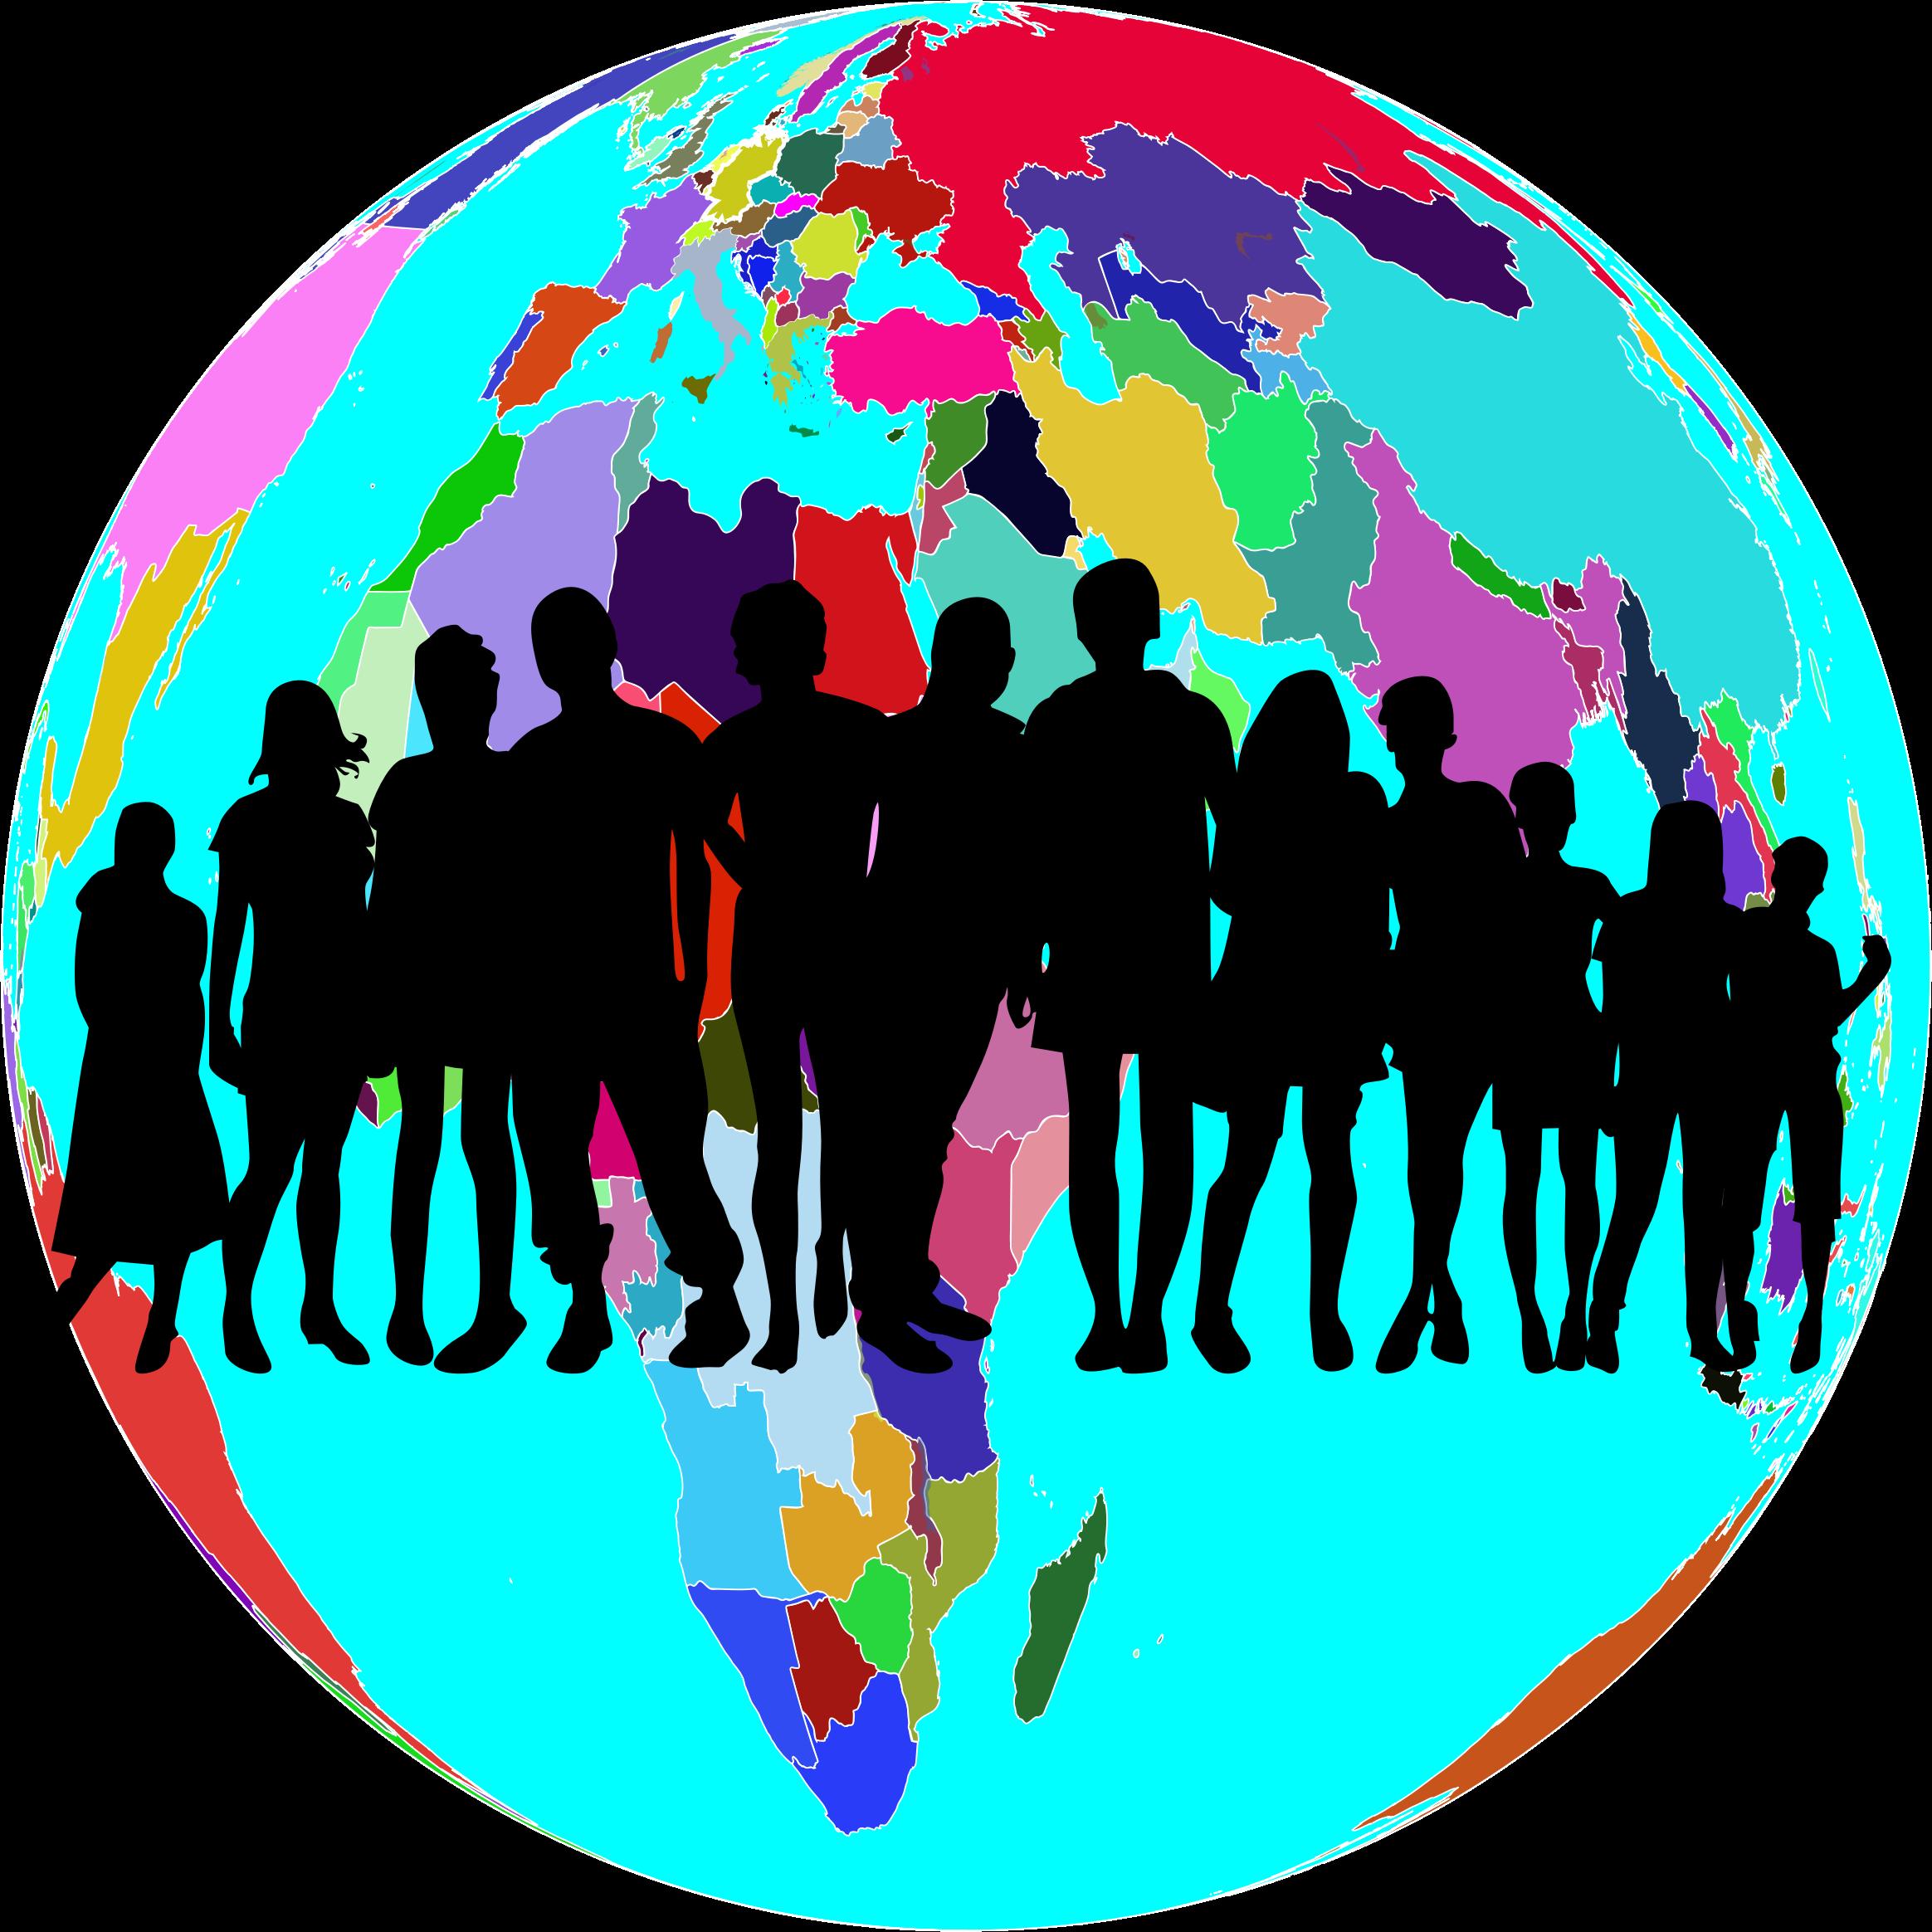 Clipart world globle. Colorful globe human family